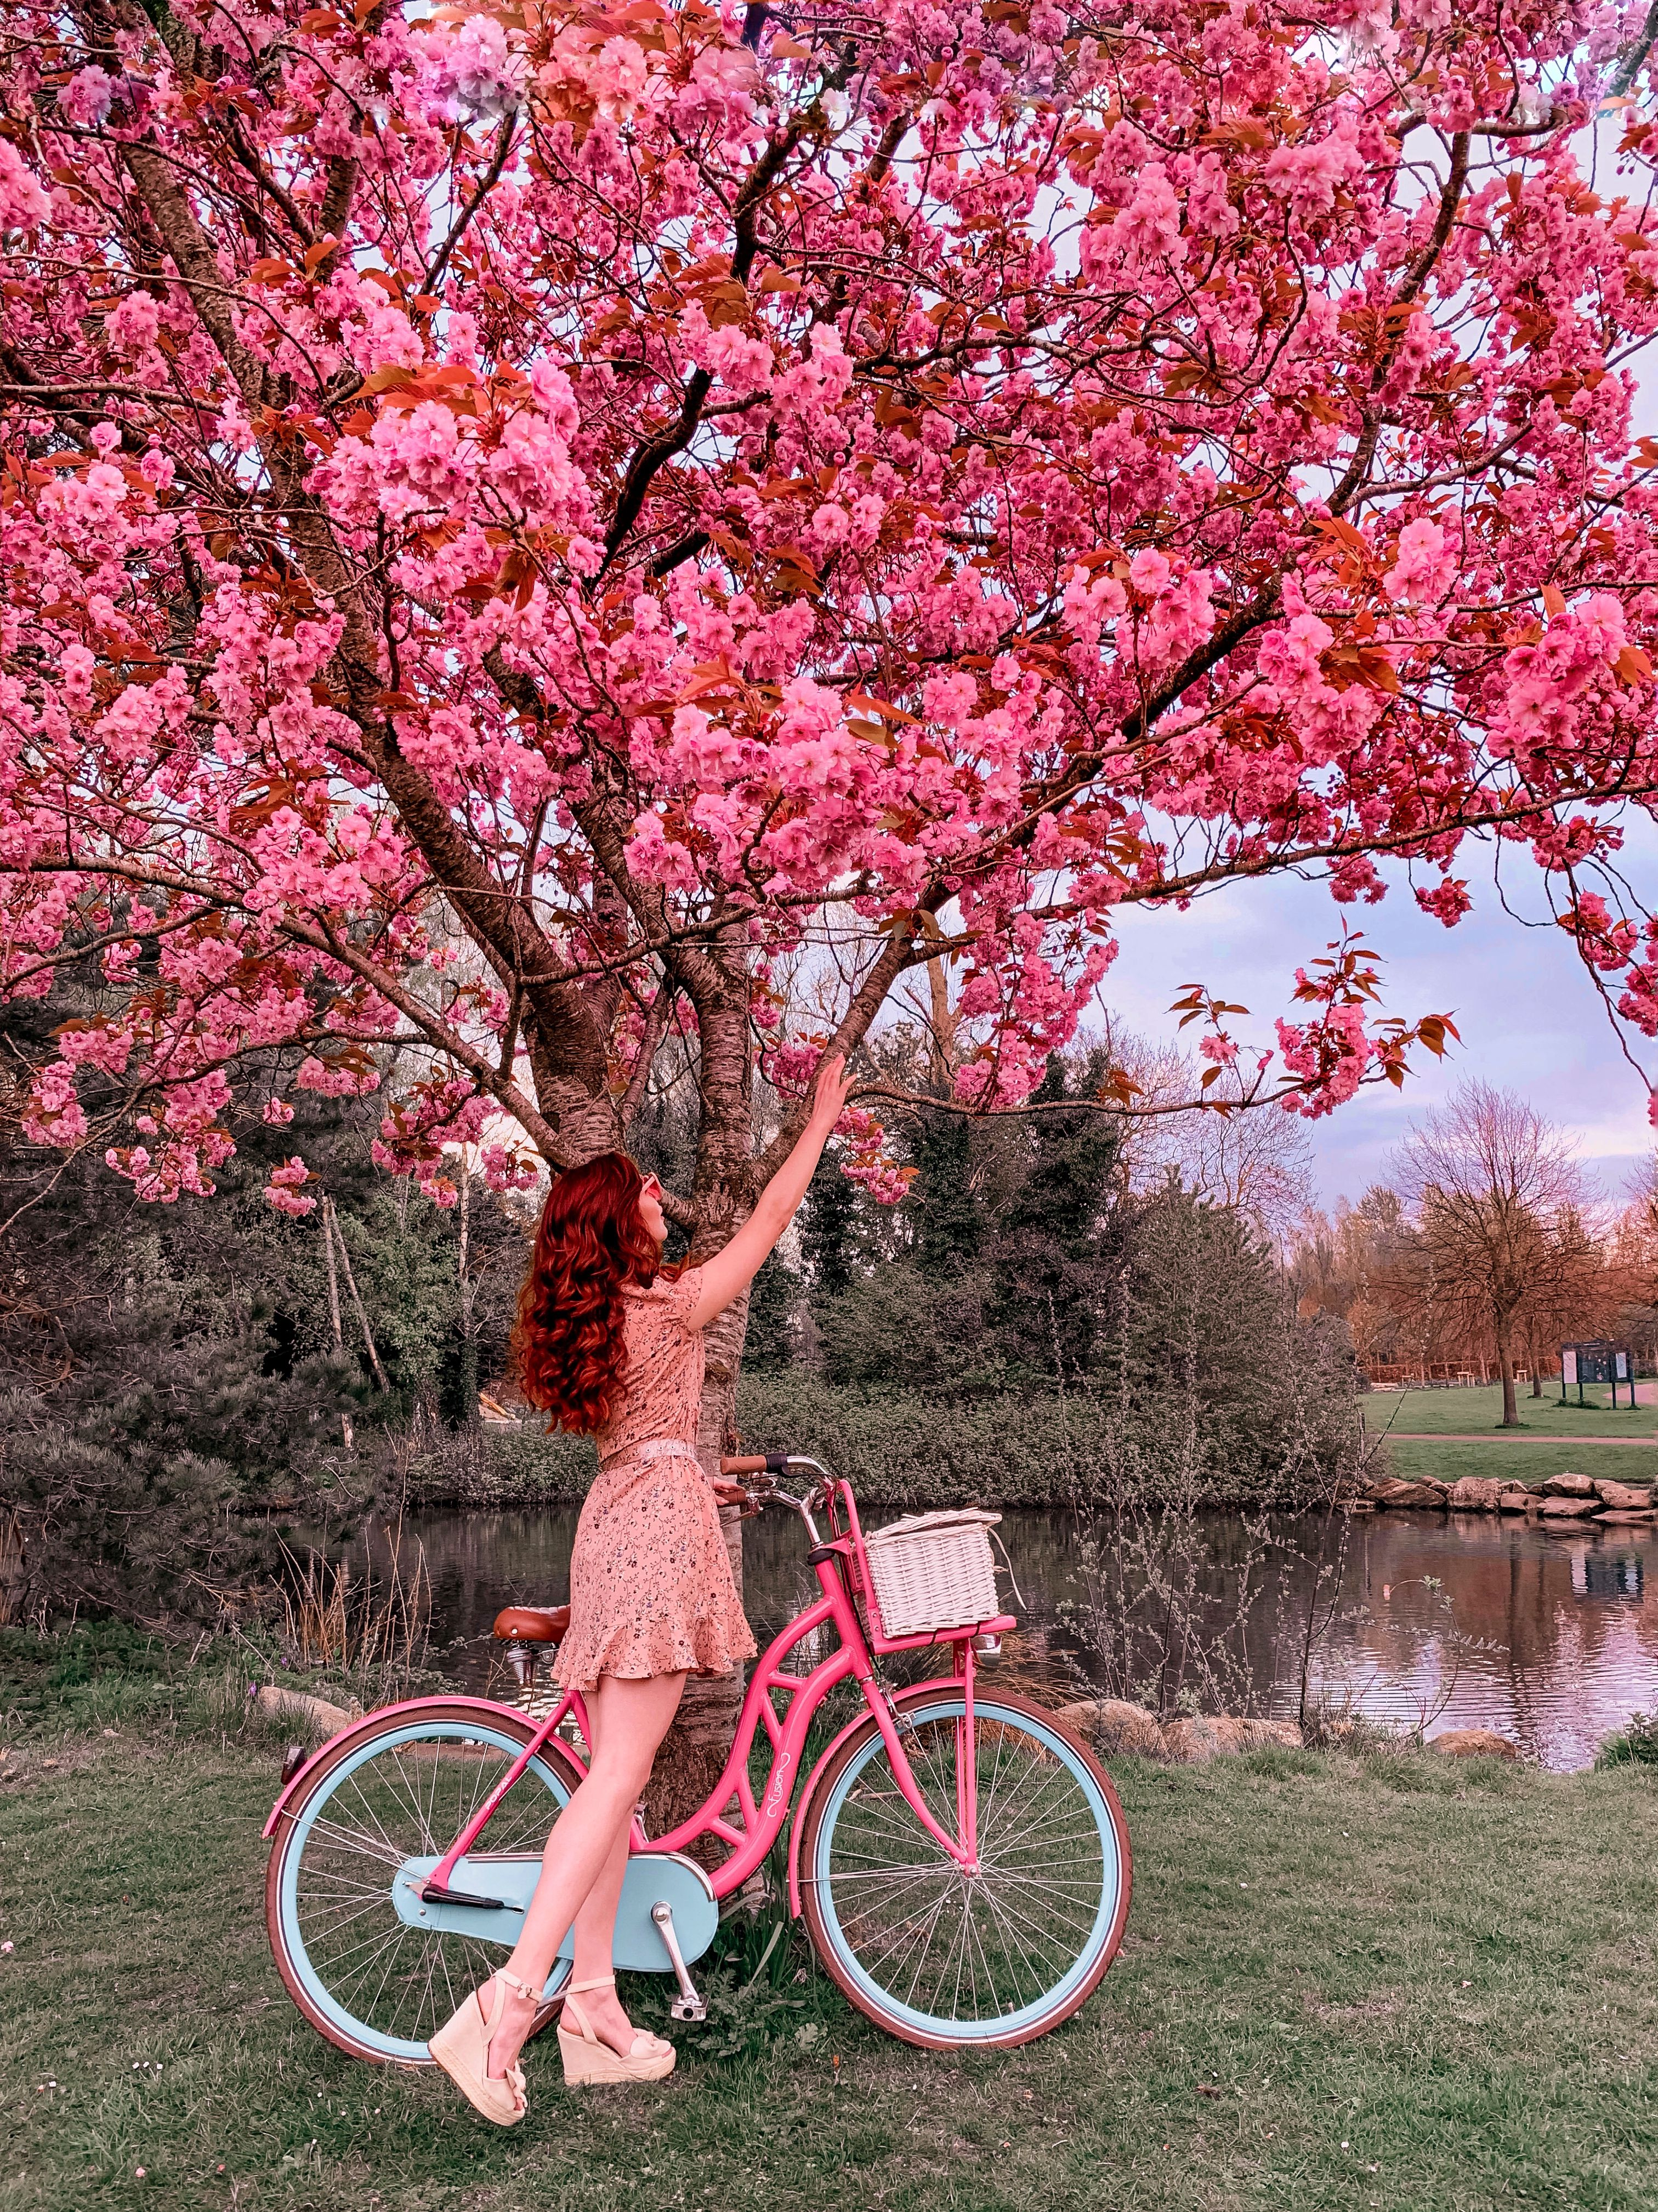 Beautiful Spring Bike And Flowers Photo Shoot Cherry Blossom Tree Instagram Photoshoot